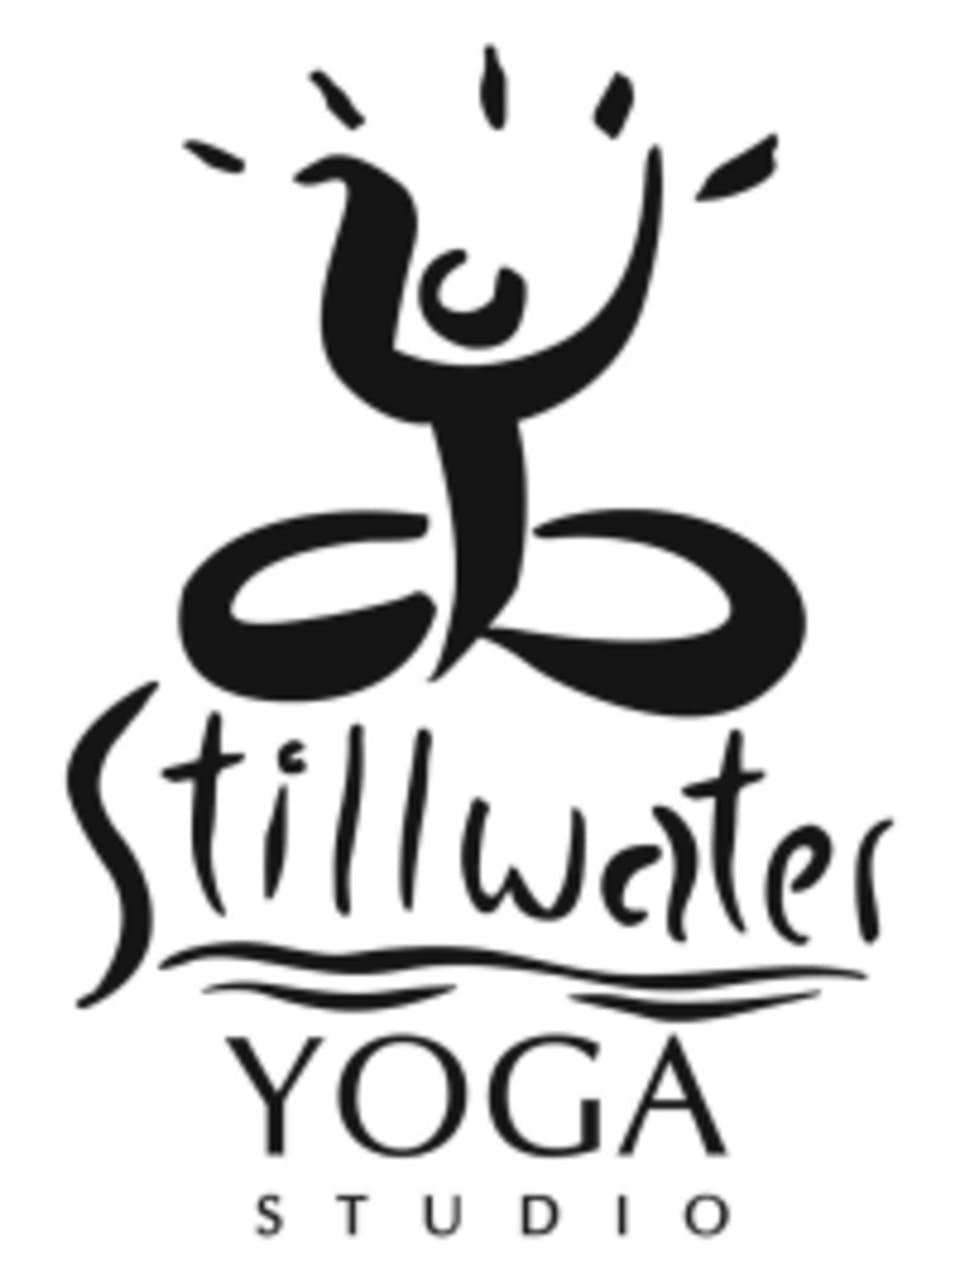 Stillwater Yoga Studio logo